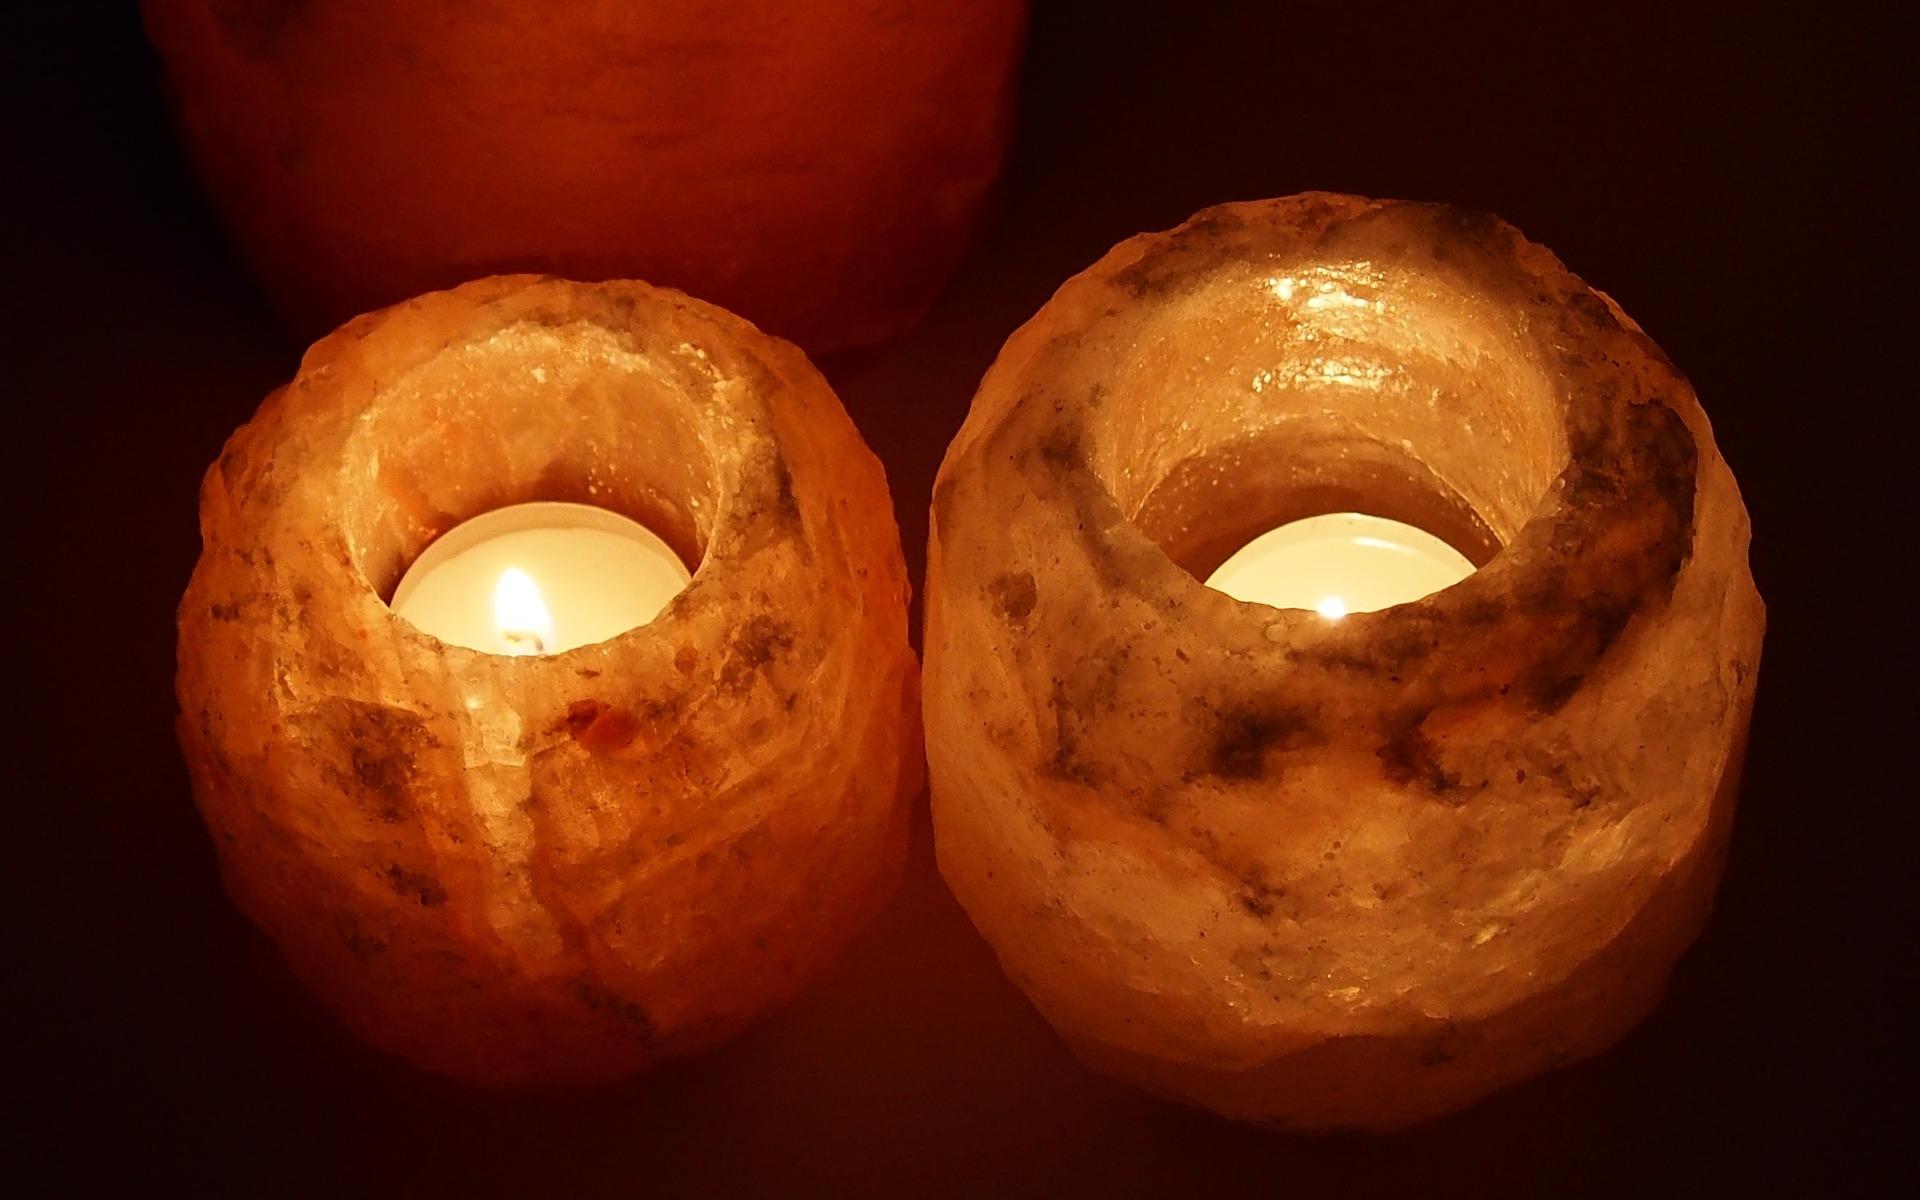 Tealights burning in Himalayan Salt candleholders